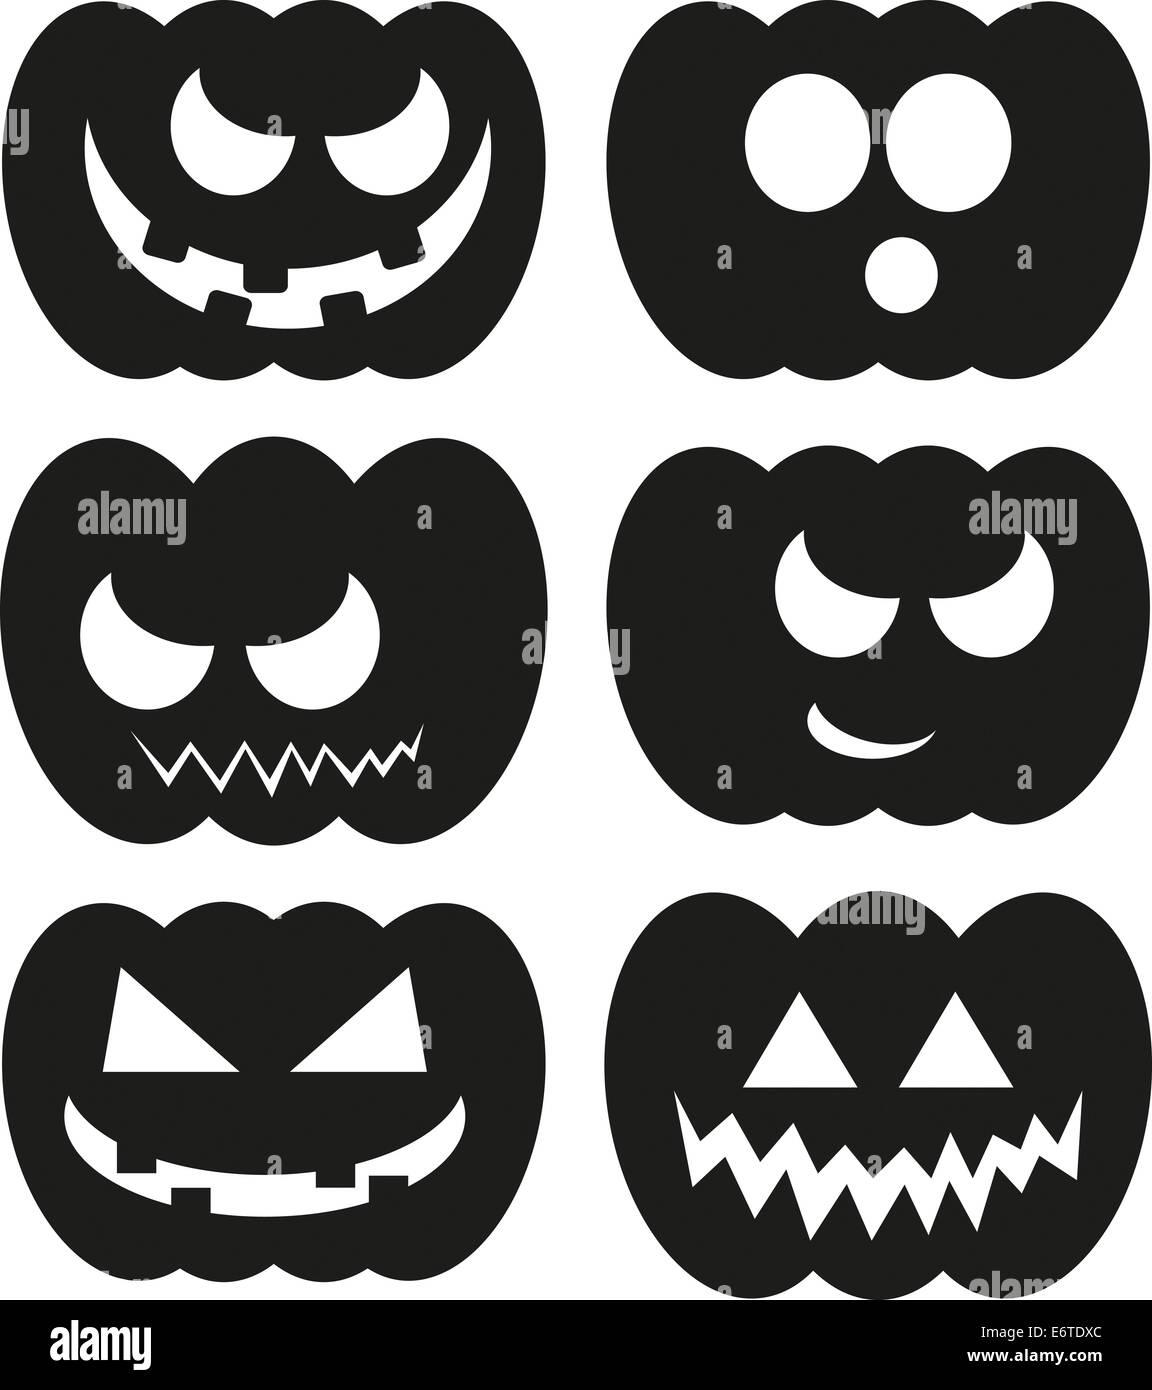 Halloween Kuerbis Kuerbisse Gesichter Ausdruck Gesichtsausdruck Vektor Vector Vektorpaket Set verschiedene Package - Stock Image